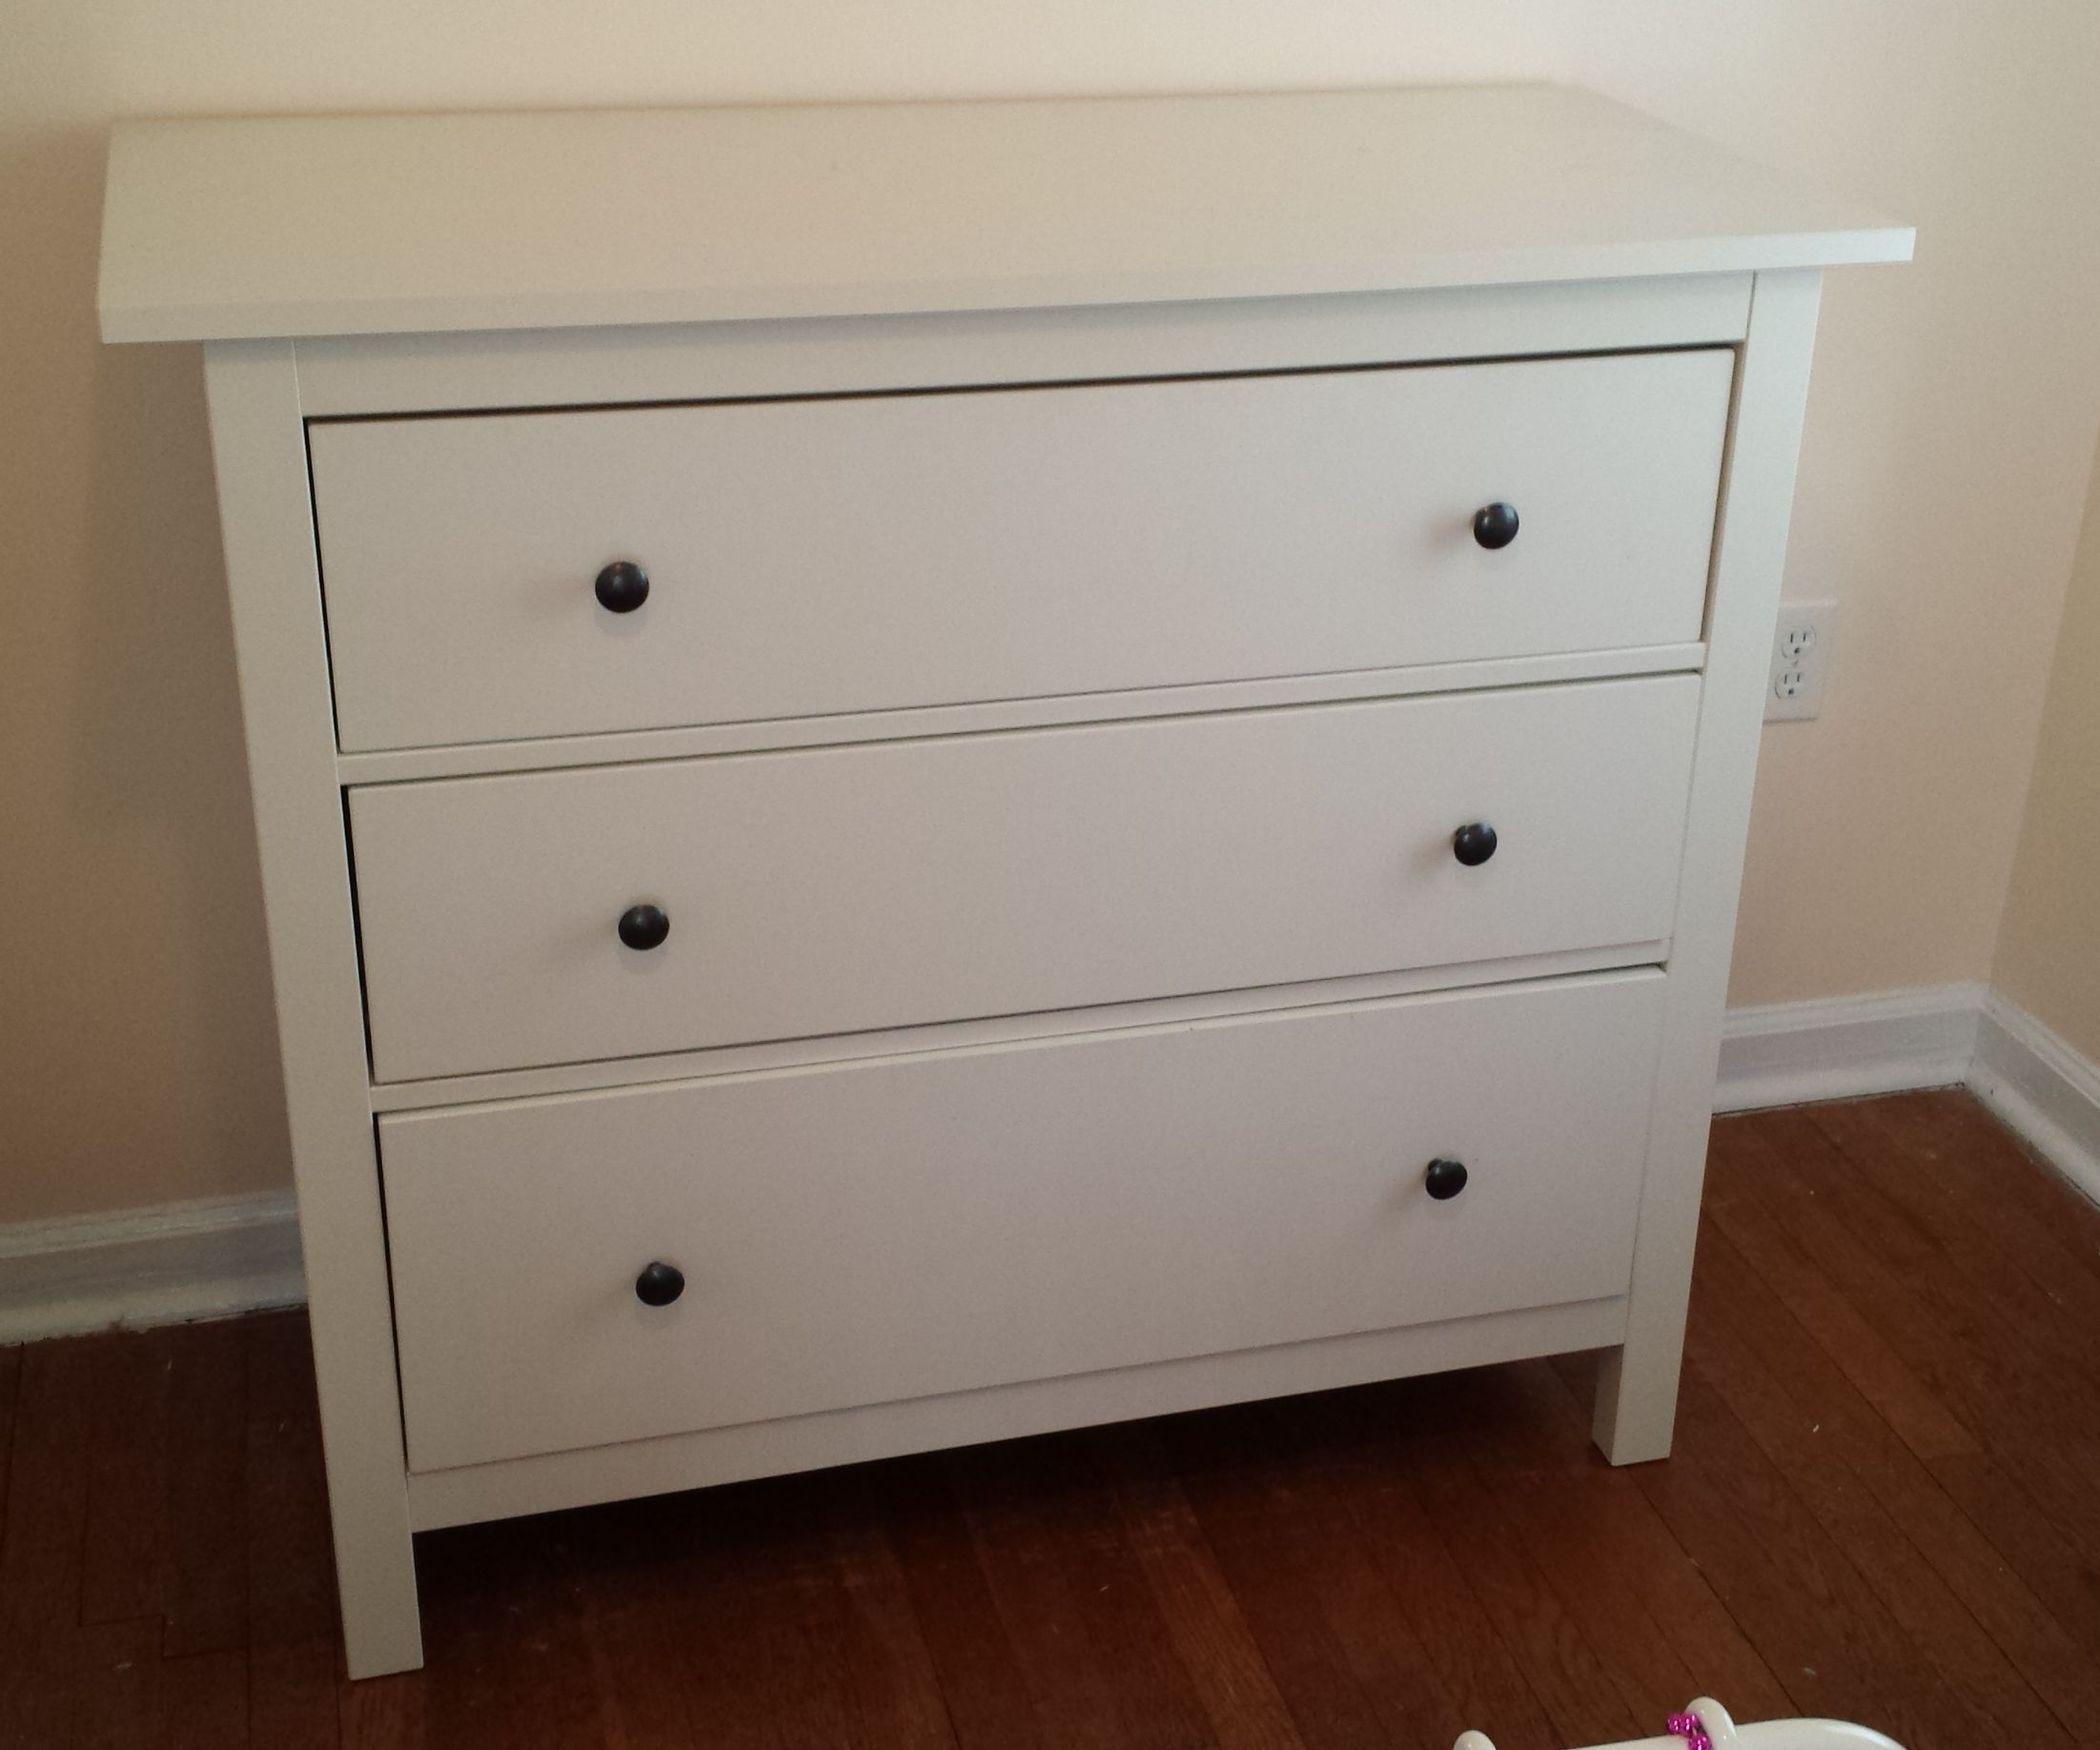 Fixing Saggy Drawers Built In Dresser Ikea Hemnes Drawers Ikea Drawers